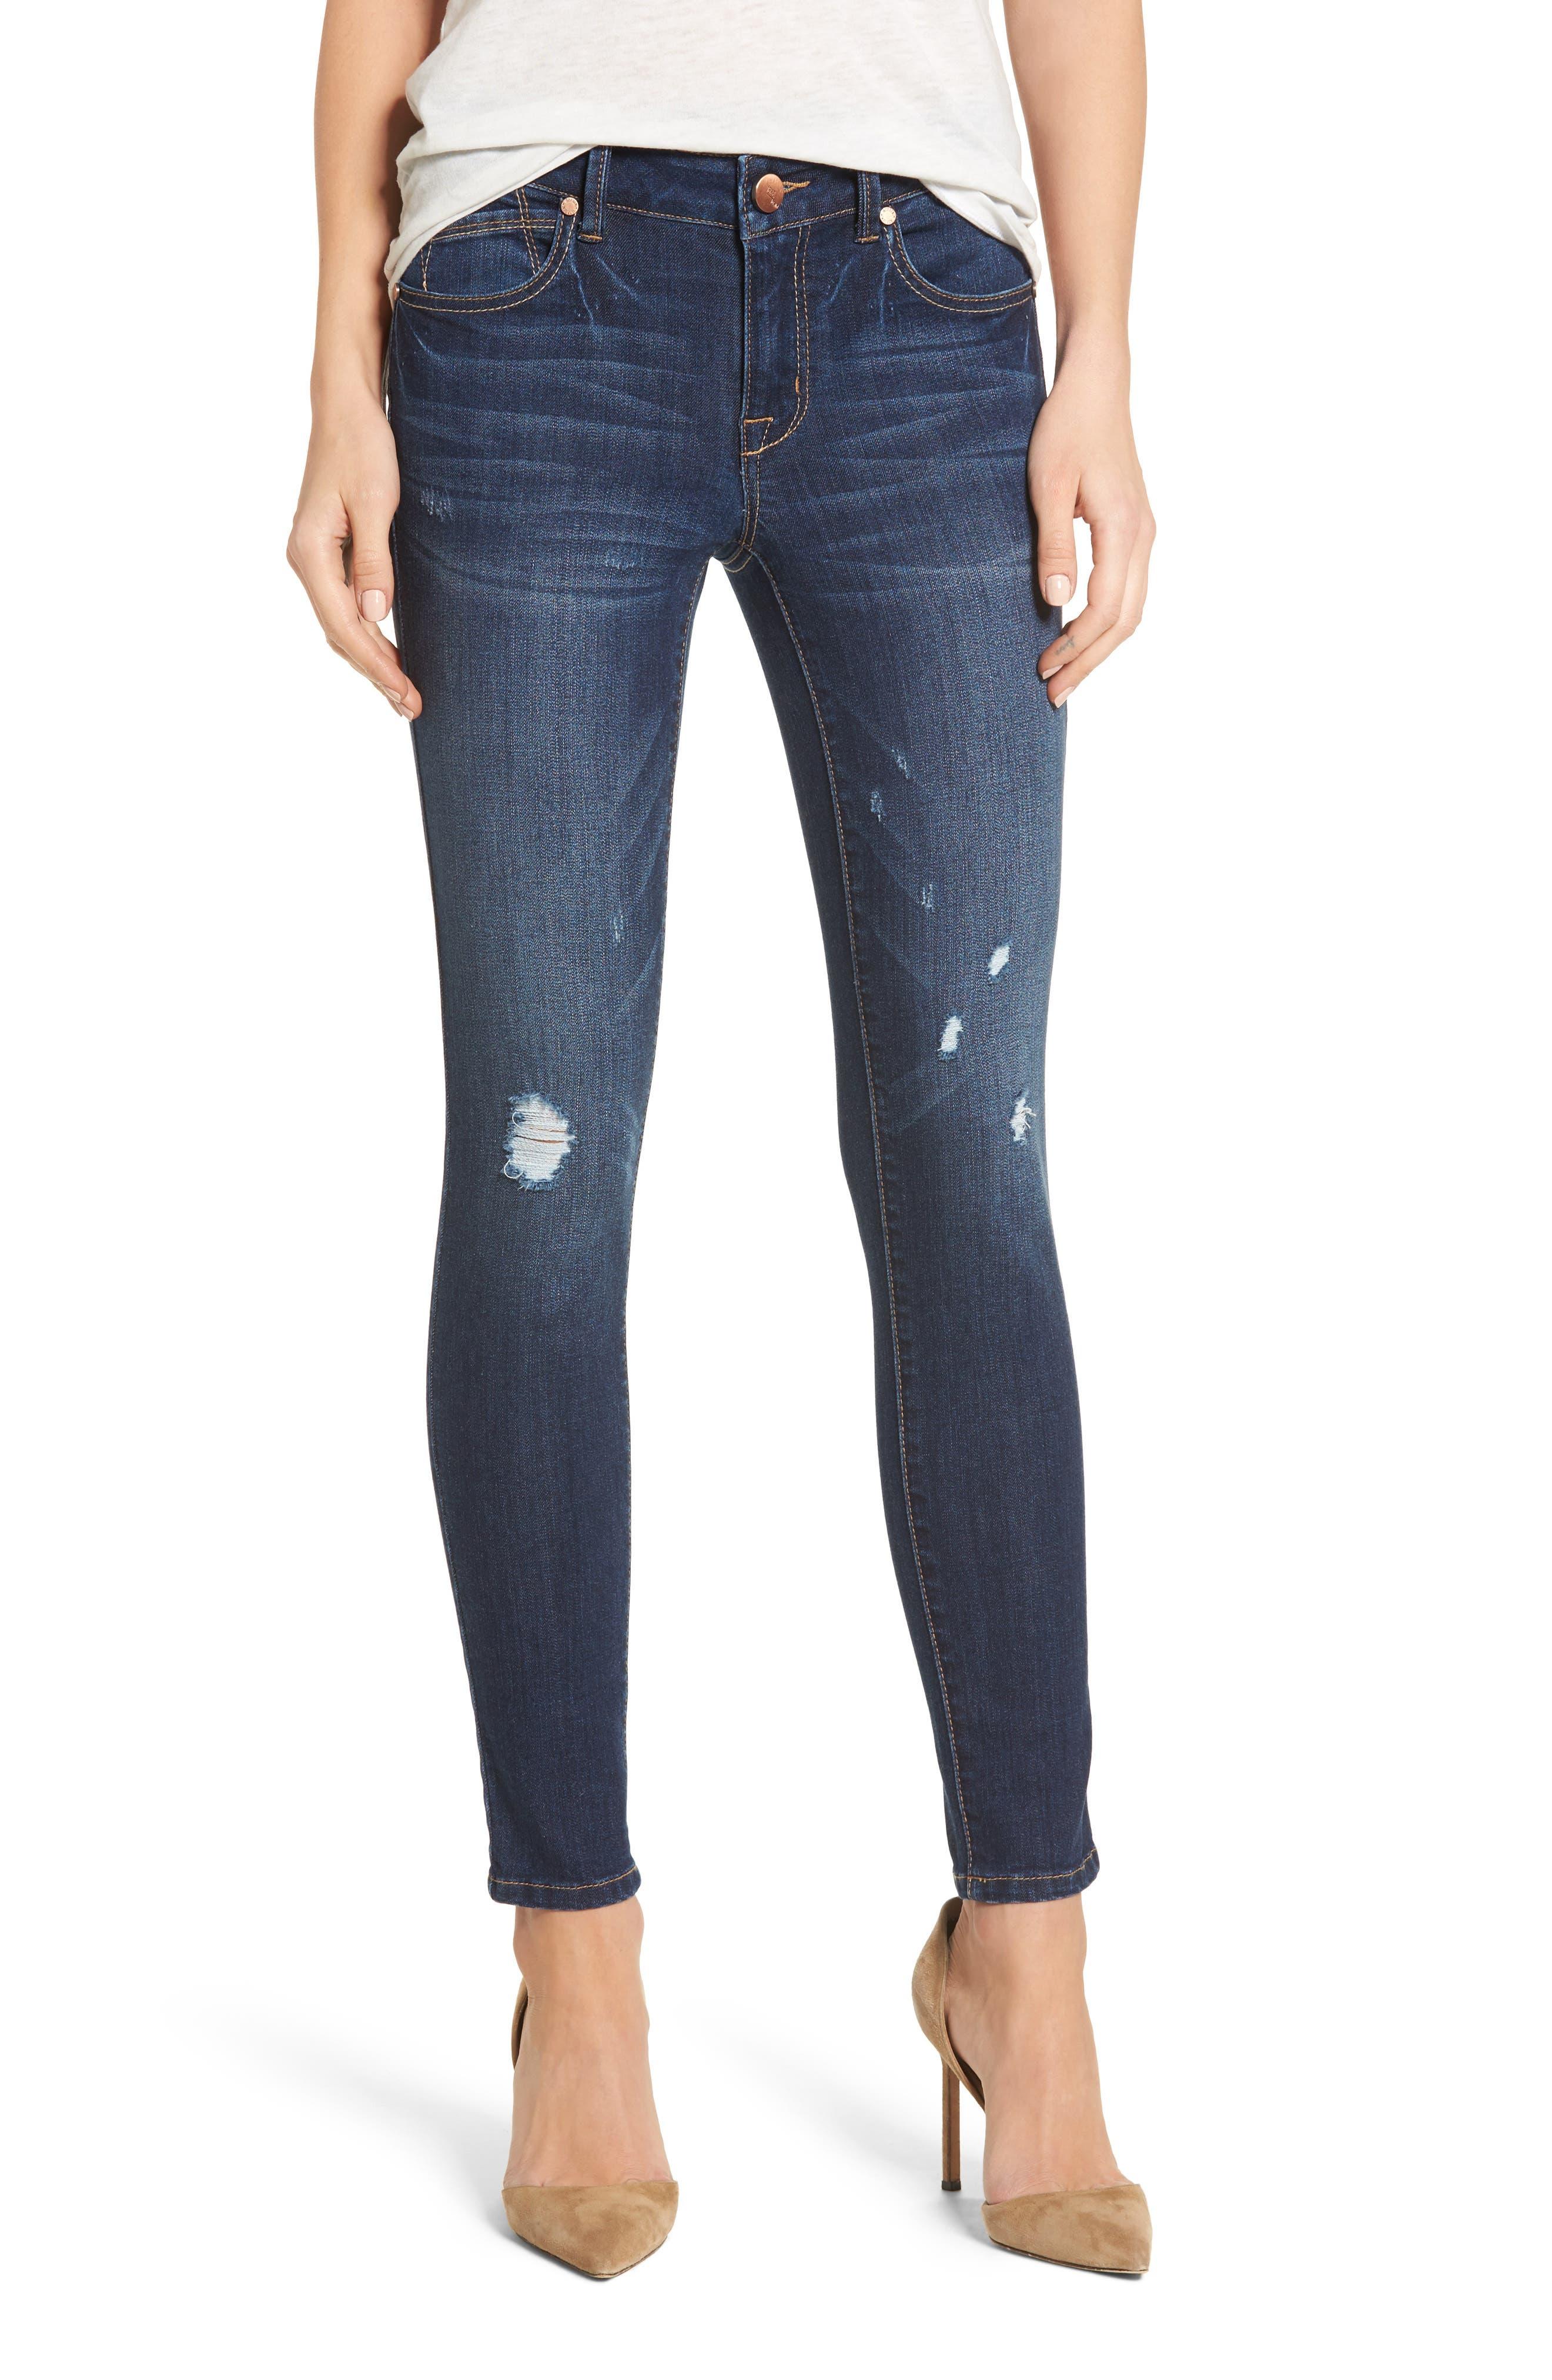 1822 Denim Ripped Skinny Jeans (New York)